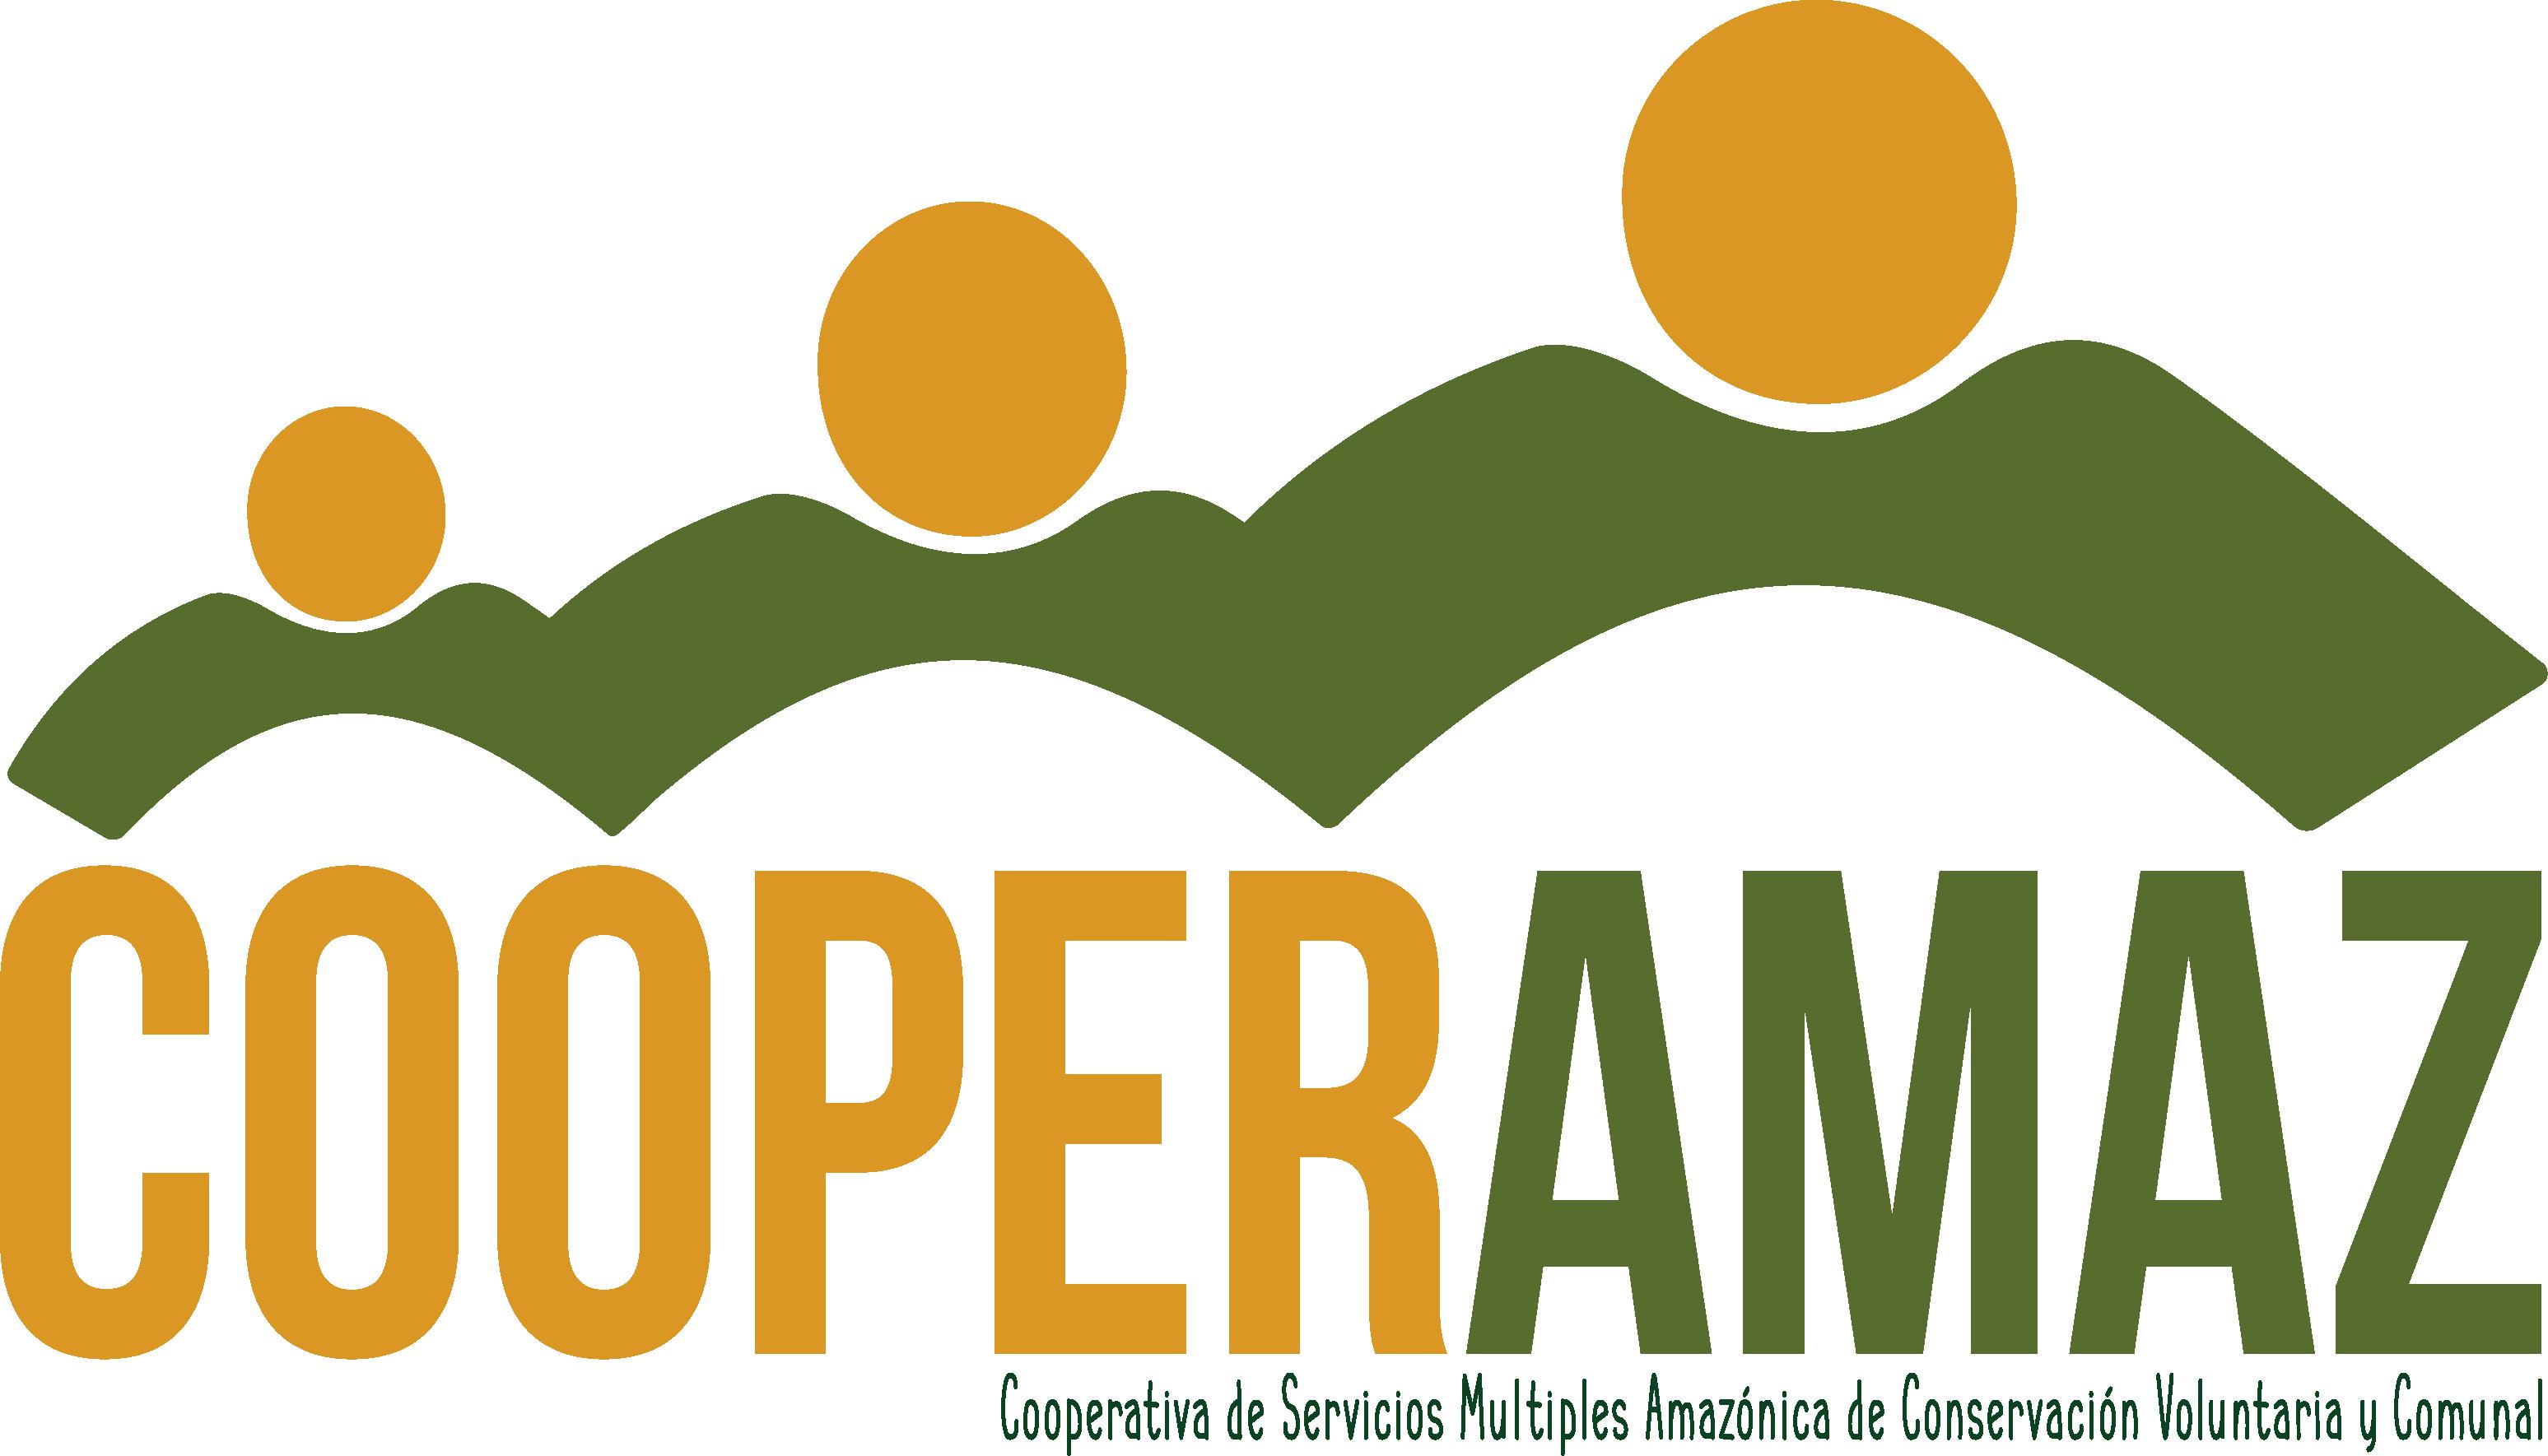 Cooperamaz – Cooperativa de Servicios Múltiples Amazónica de Conservación Voluntaria y Comunal